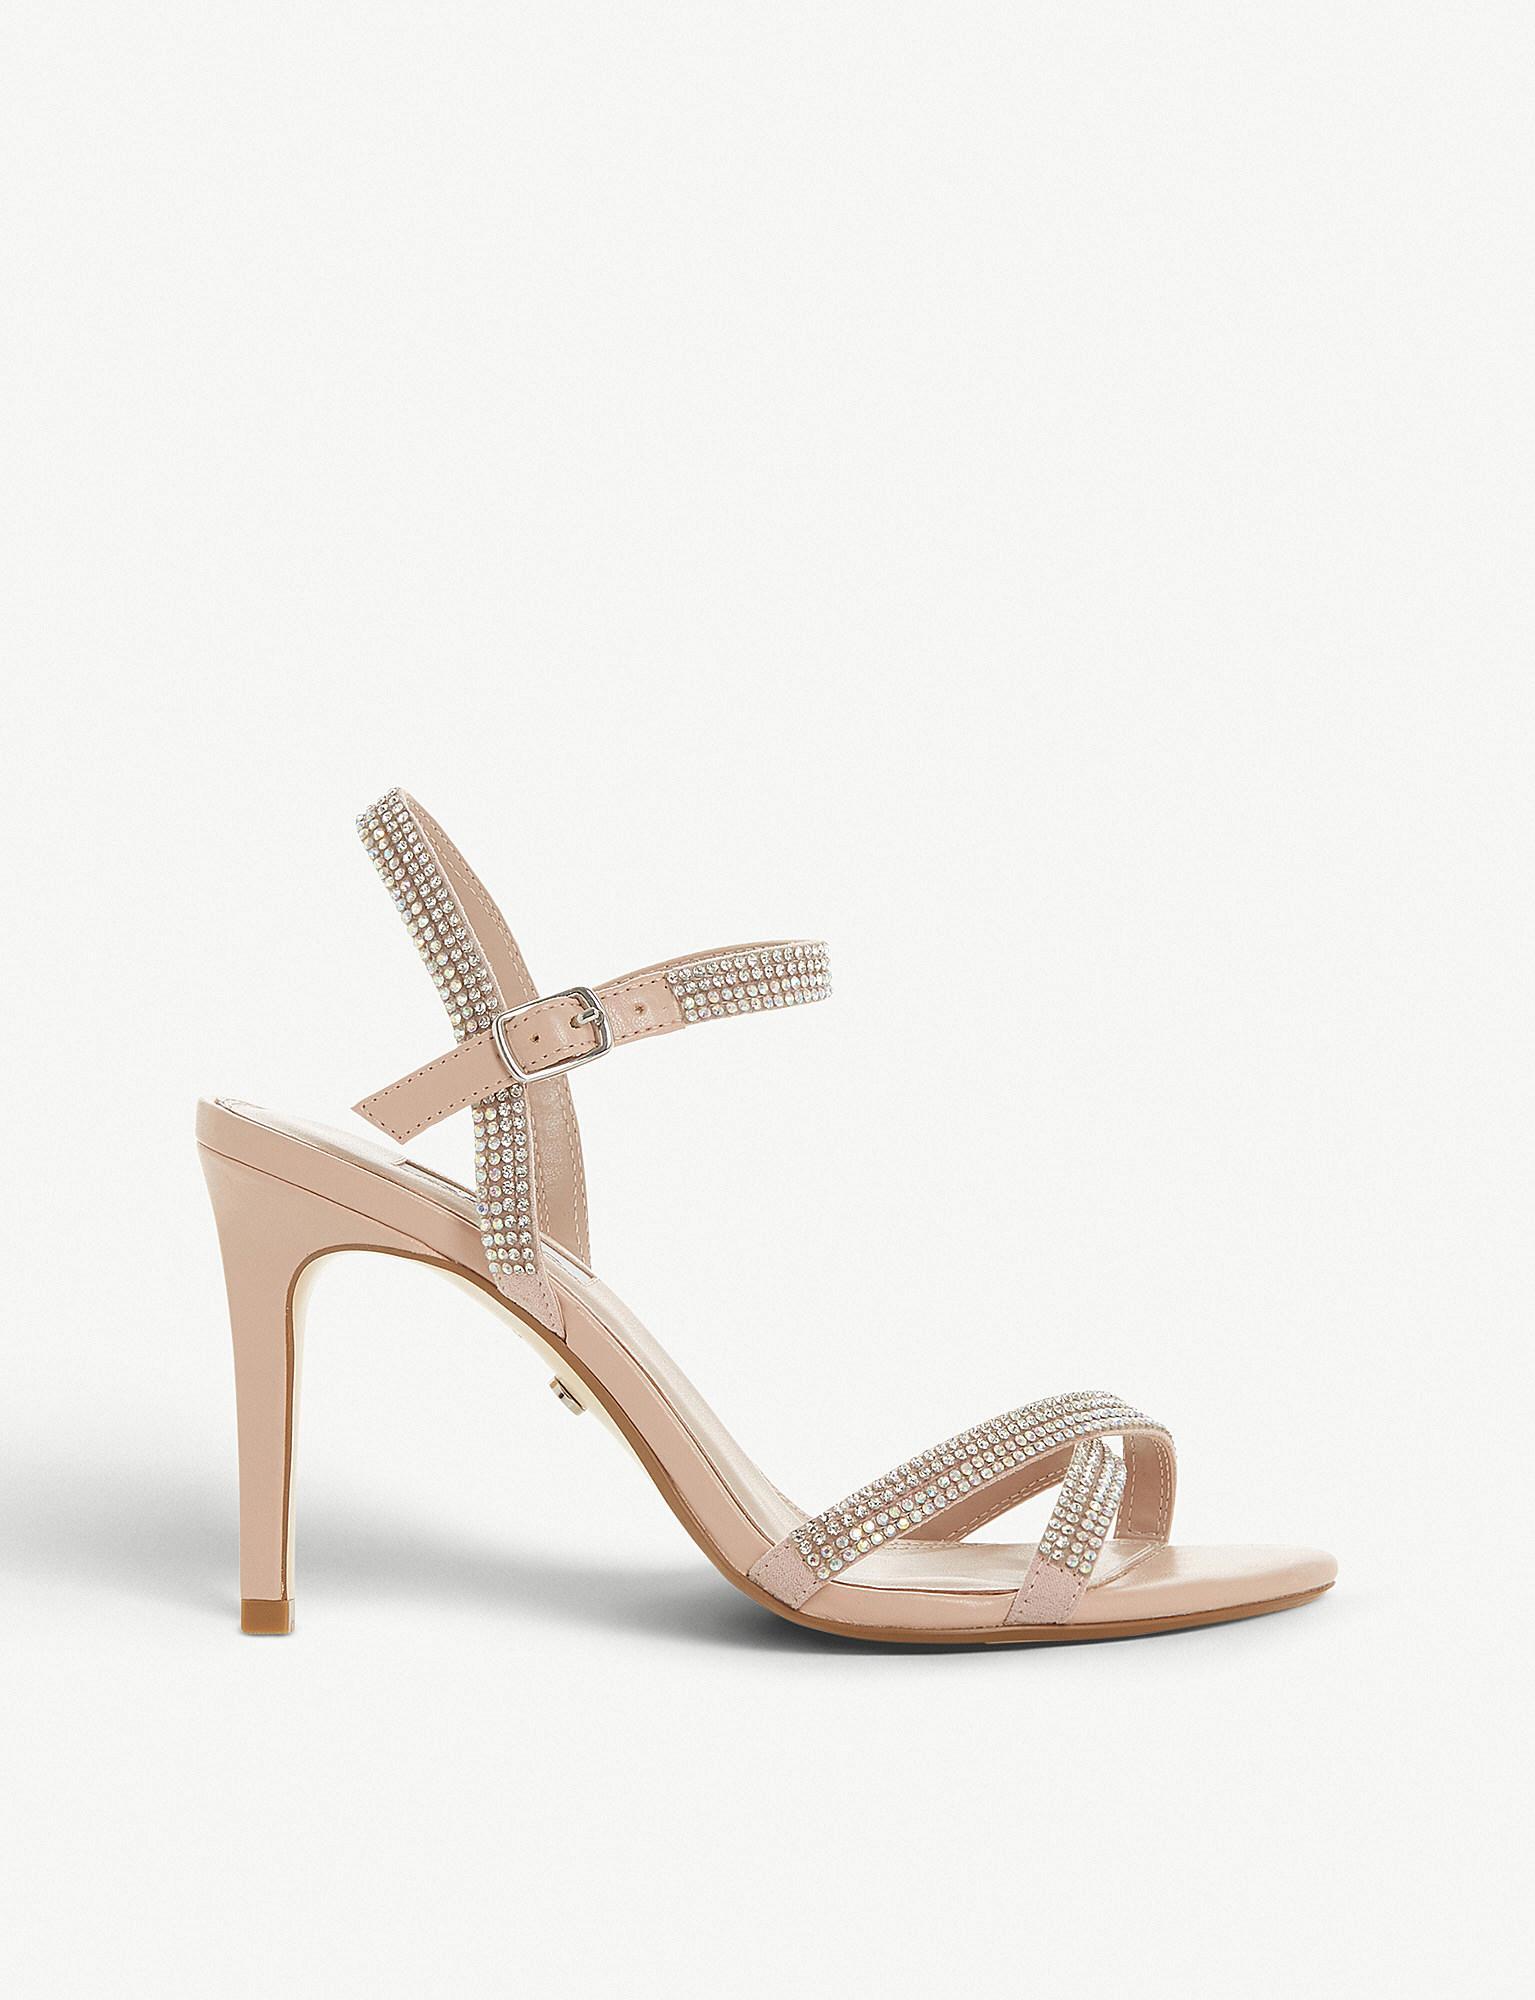 d396d13bea7915 Dune. Women s Magdalena Diamante-embellished Sandals